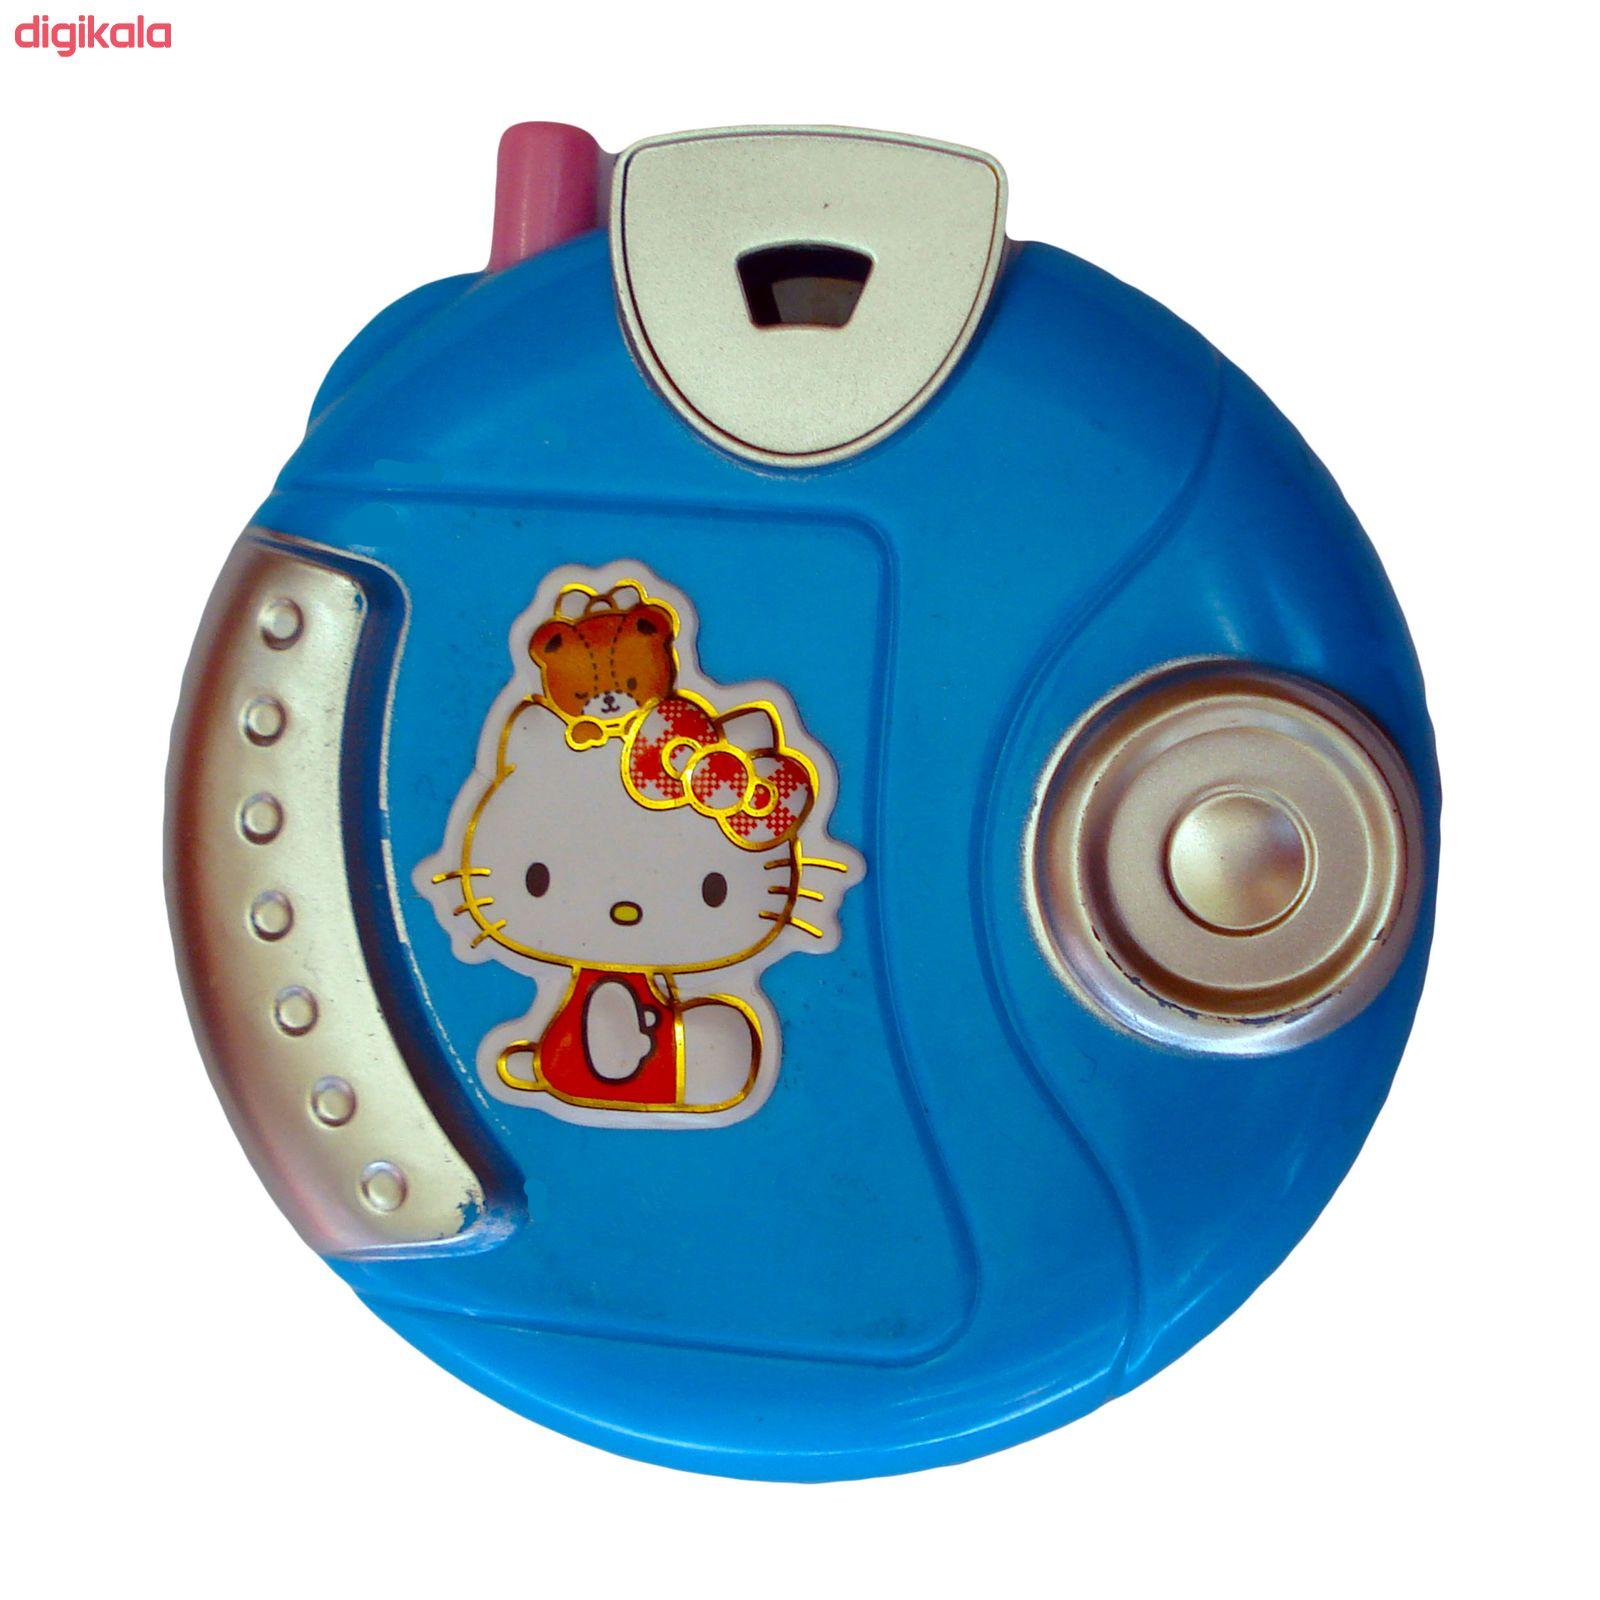 اسباب بازی دوربین عکاسی مدل CAT کد BC-11 main 1 1